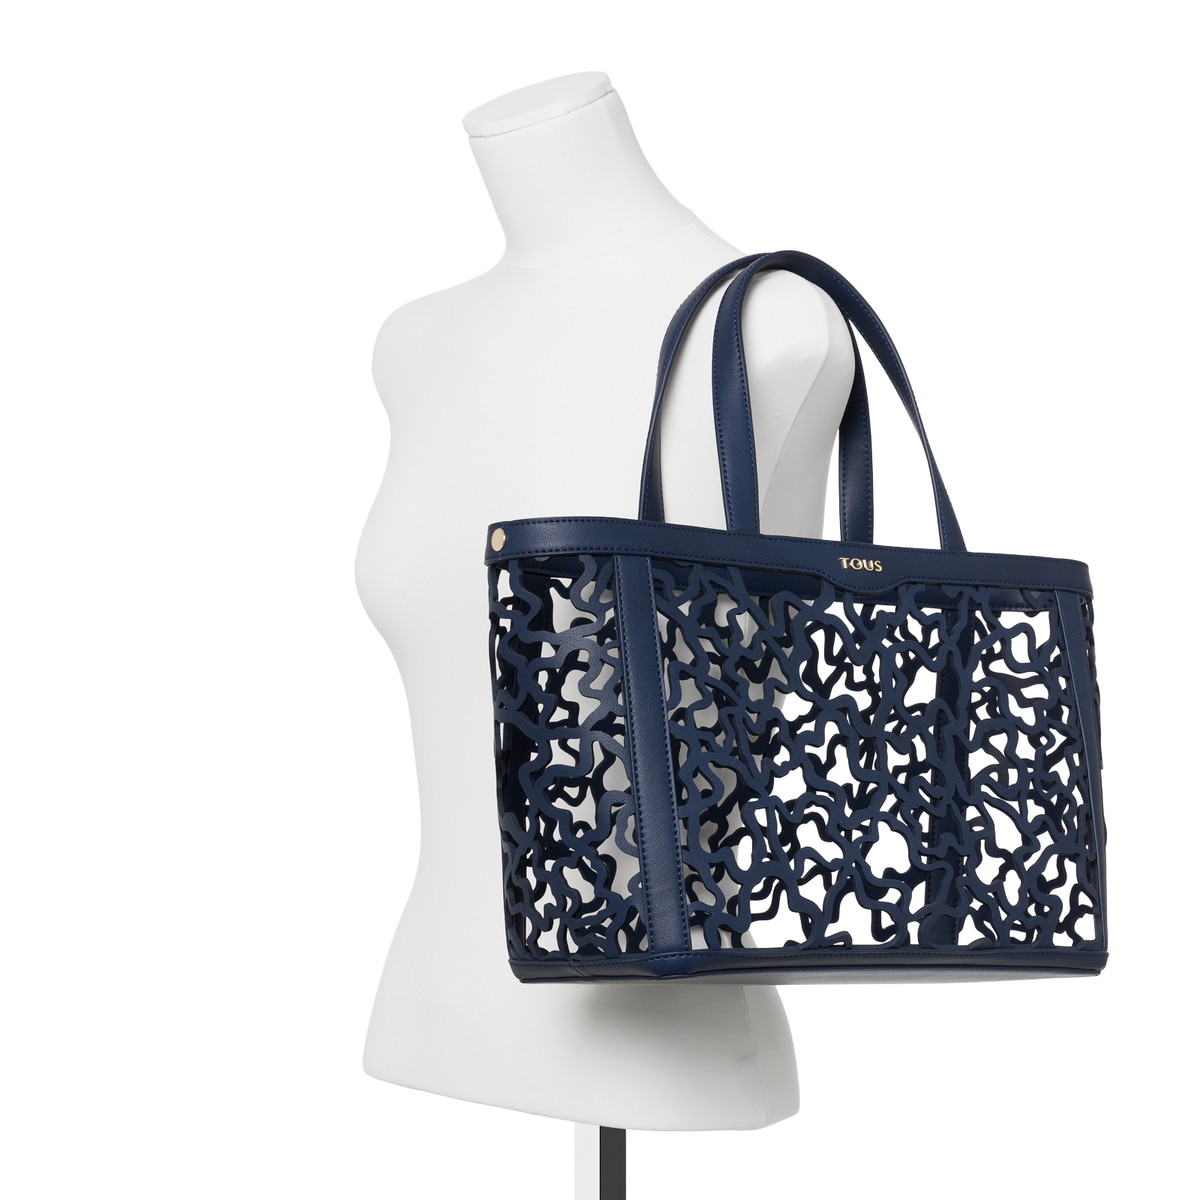 f8b08b9c3d Τσάντα μεσαίου μεγέθους Kaos Shock σε μπλε σκούρο χρώμα - Tous Site ...